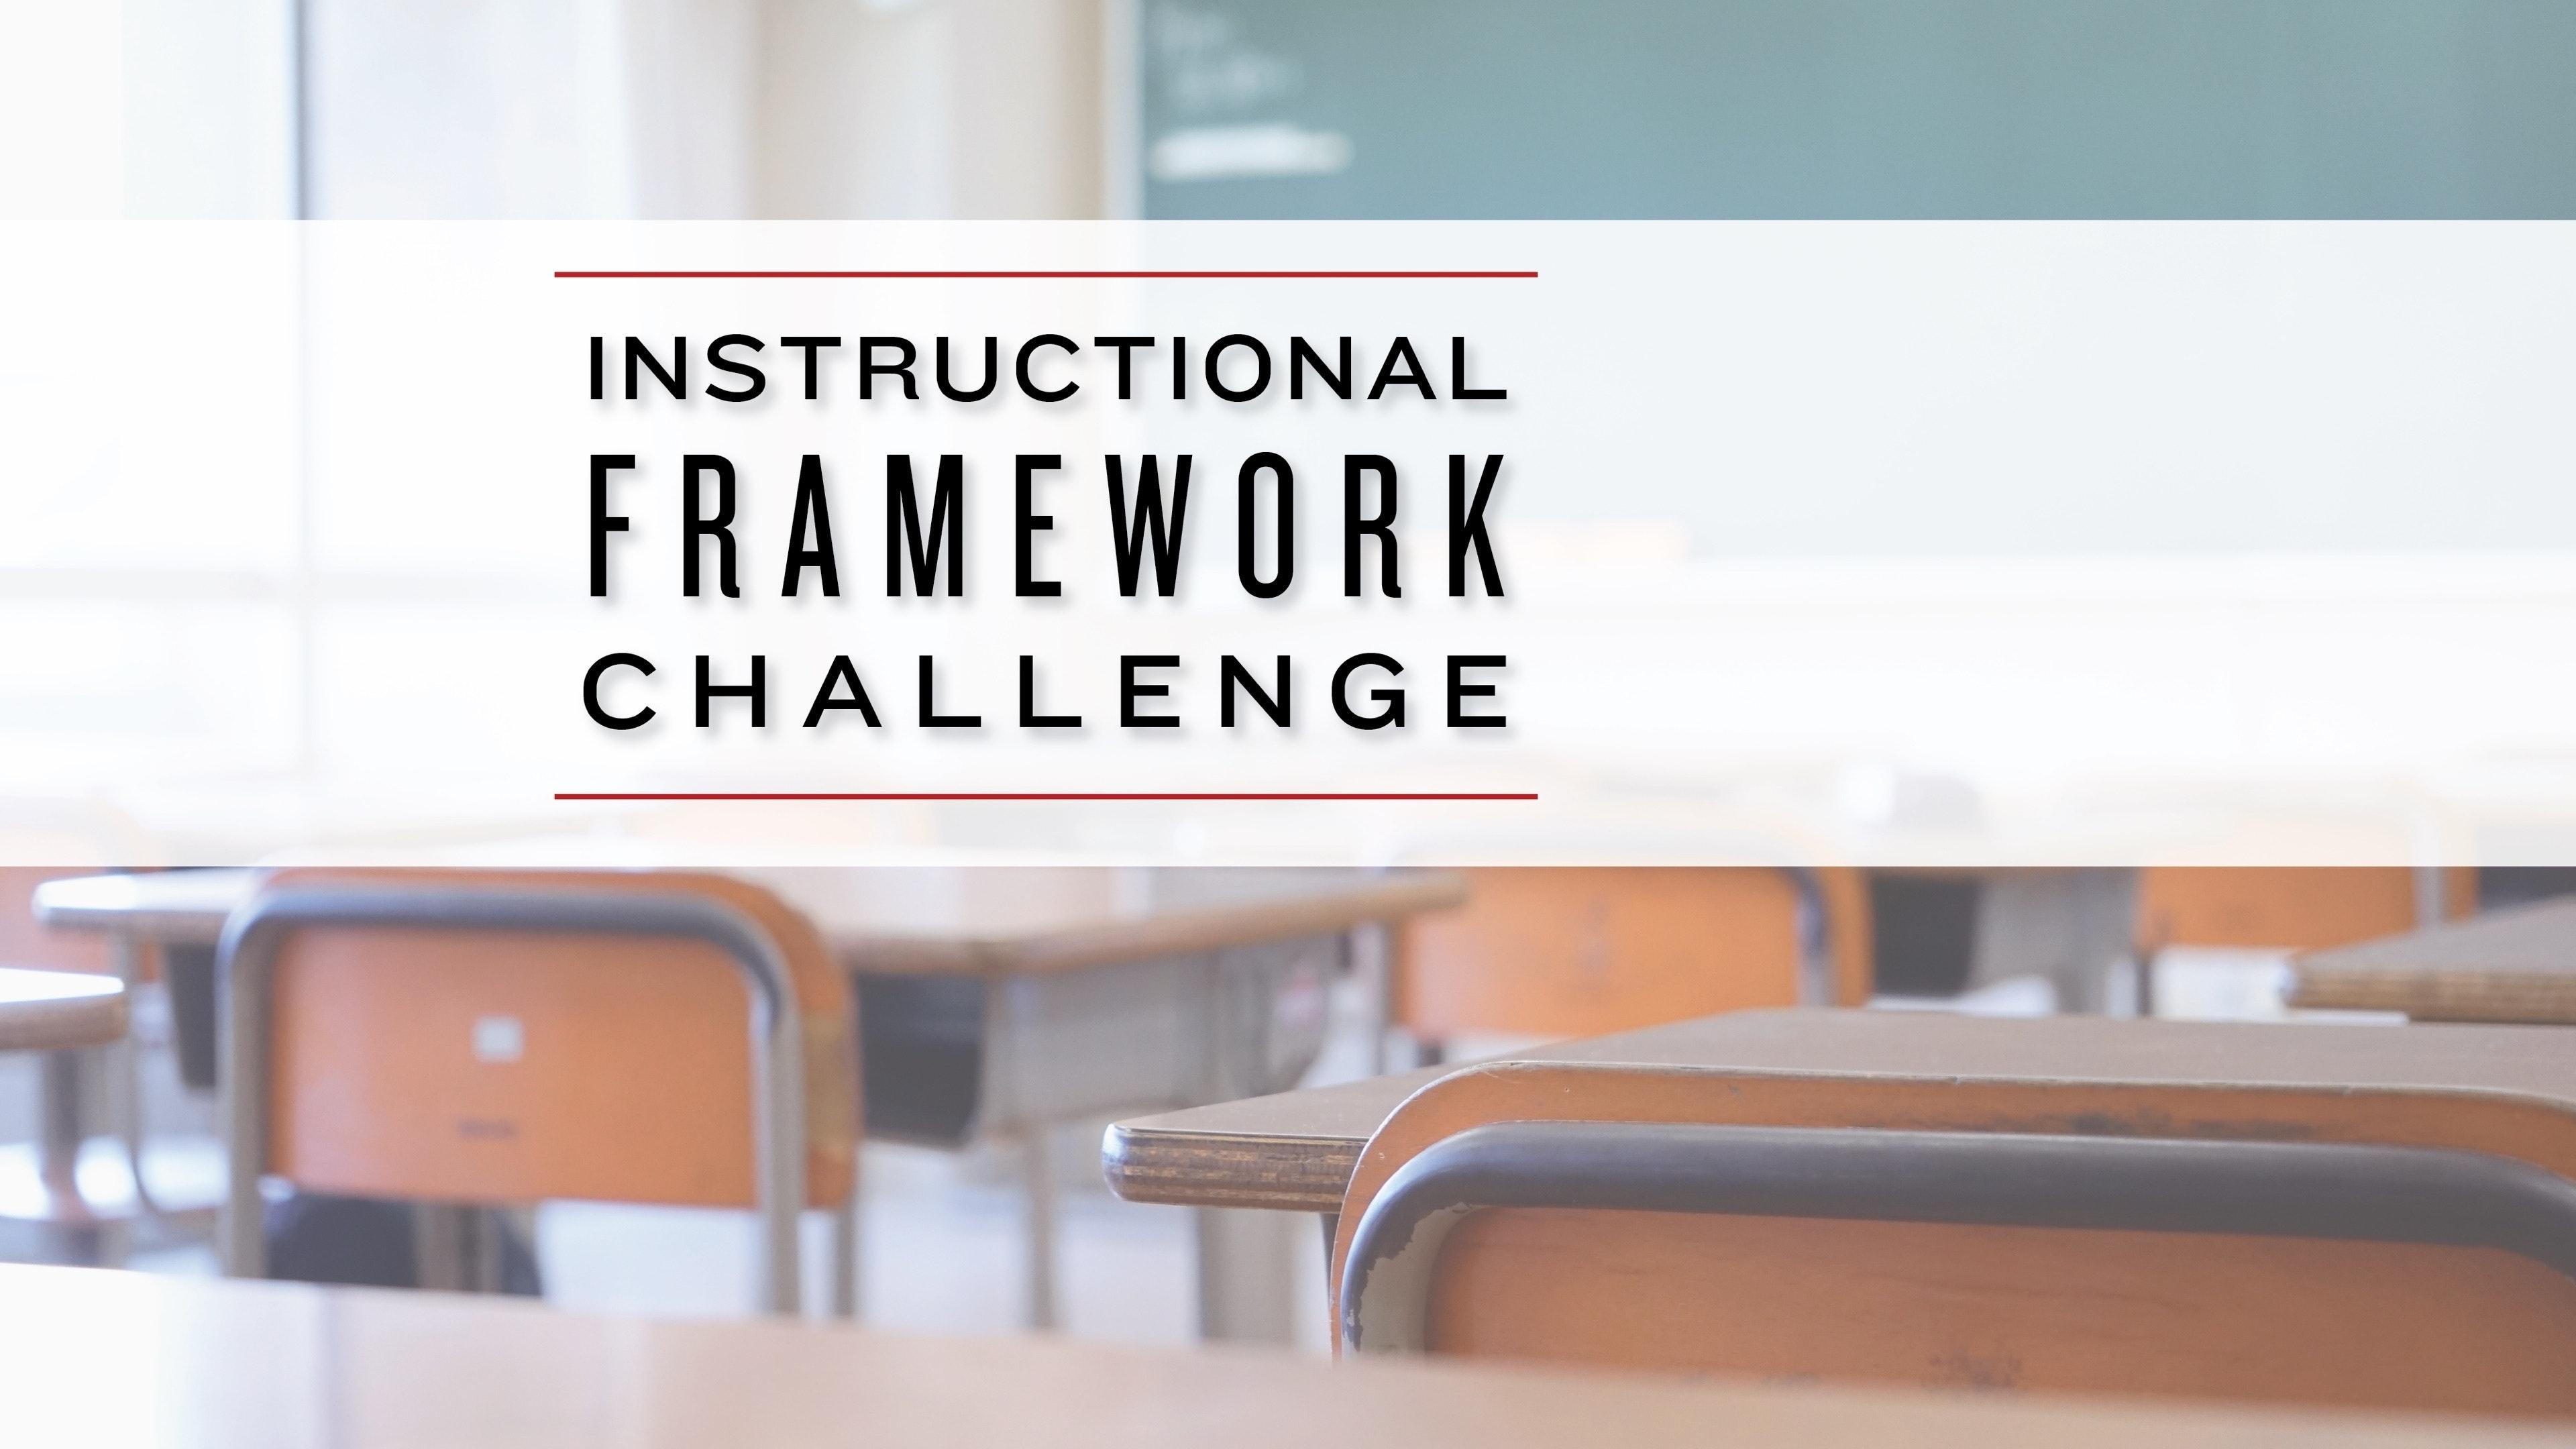 Instructional Framework Challenge